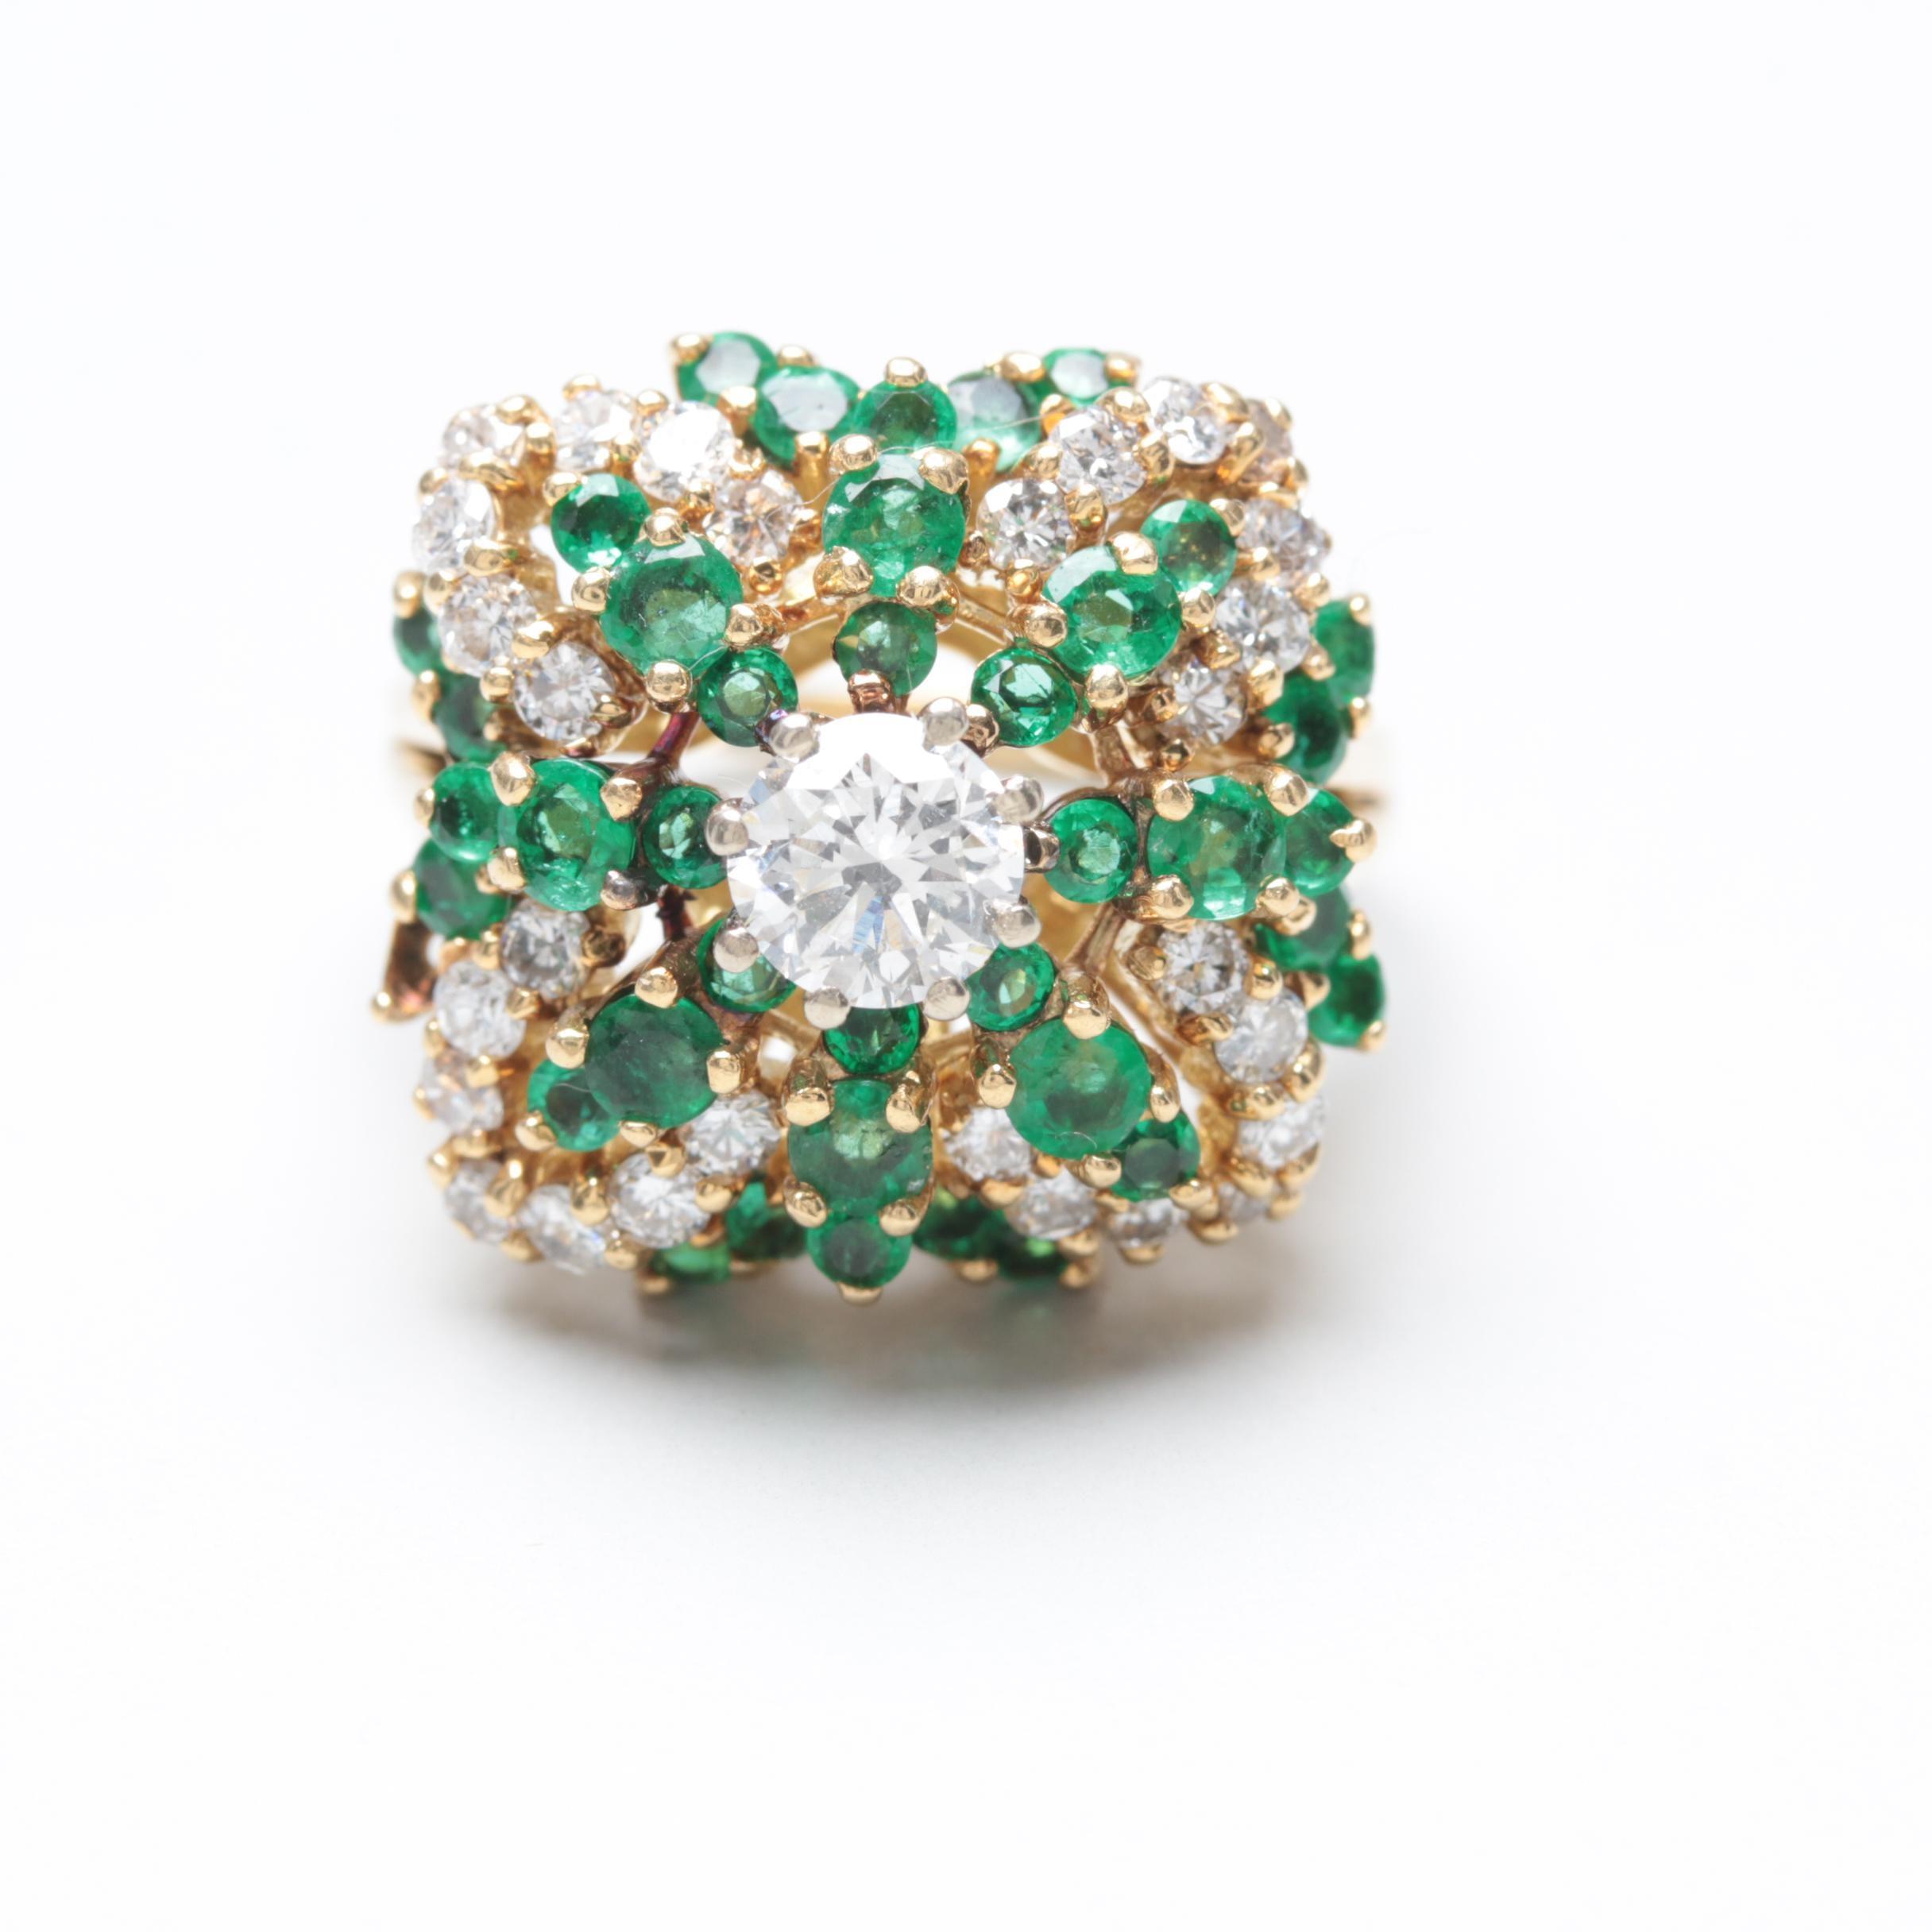 10K Yellow Gold 1.22 CTW Diamond and Emerald Ring